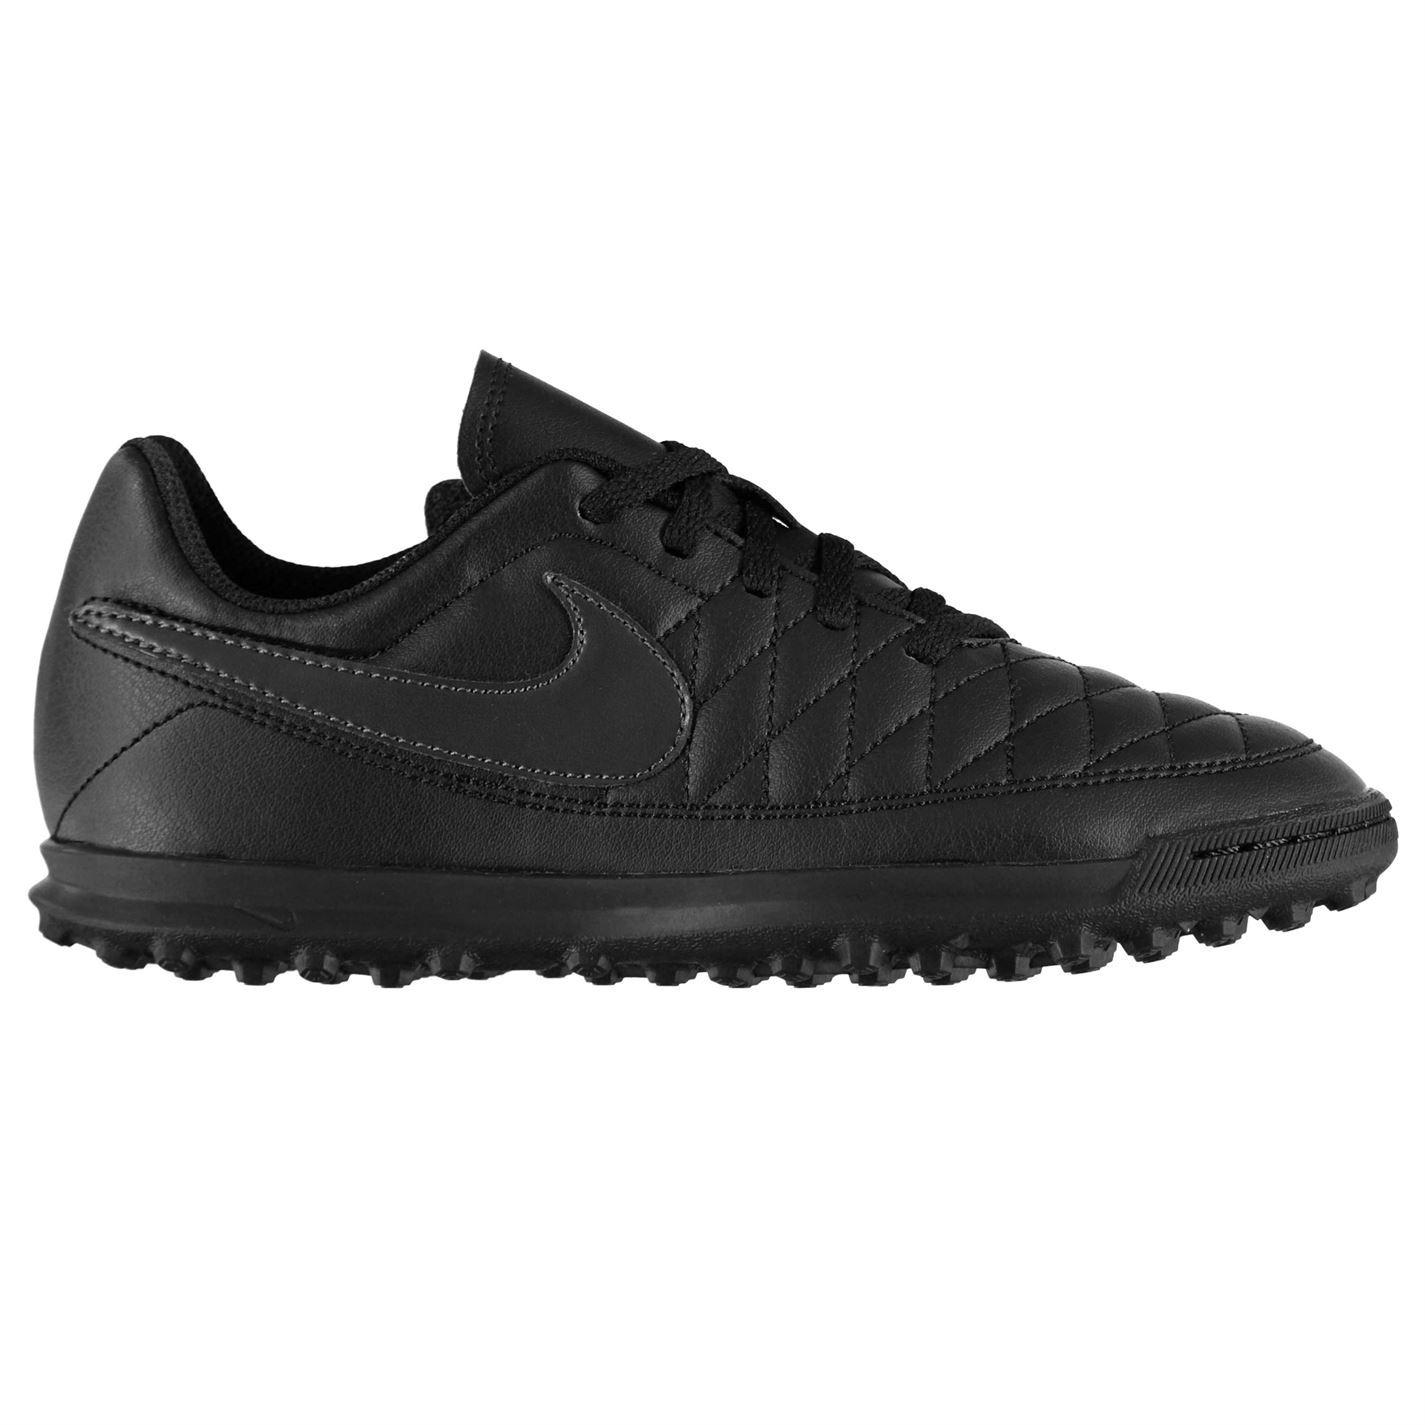 Nike-majestry-Astro-Turf-Football-Baskets-Juniors-Football-Baskets-Chaussures miniature 5